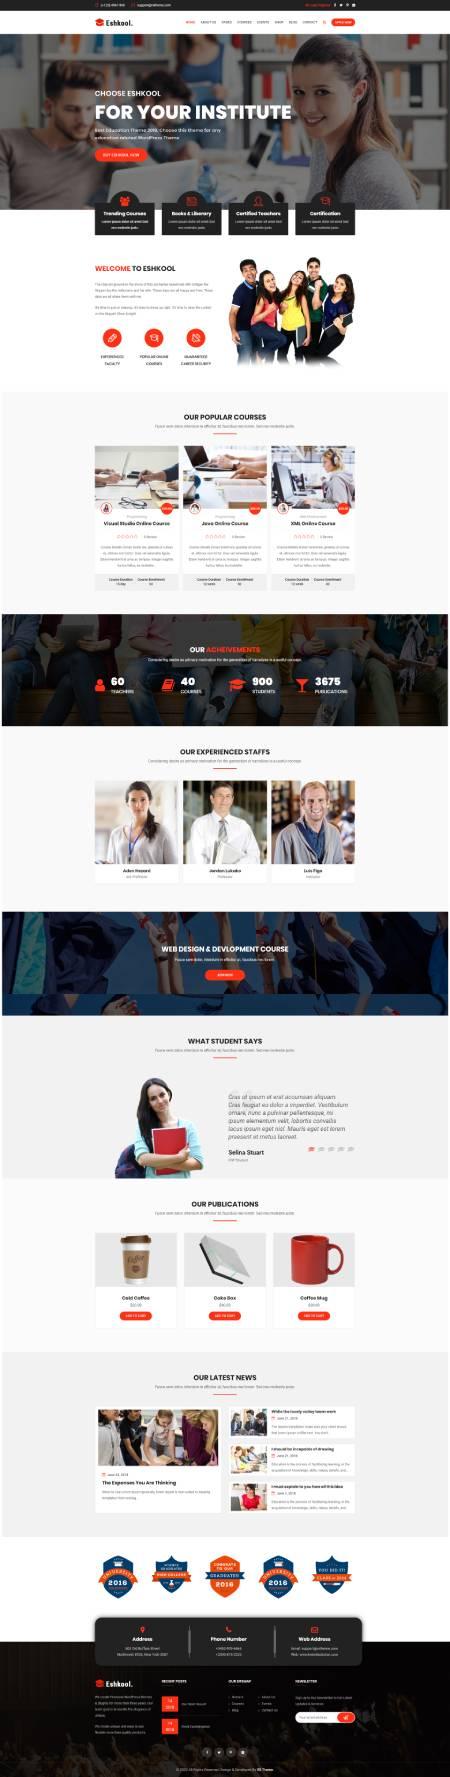 GD0067 – Mẫu Website Giới Thiệu Trung Tâm Dạy Học Eshkool